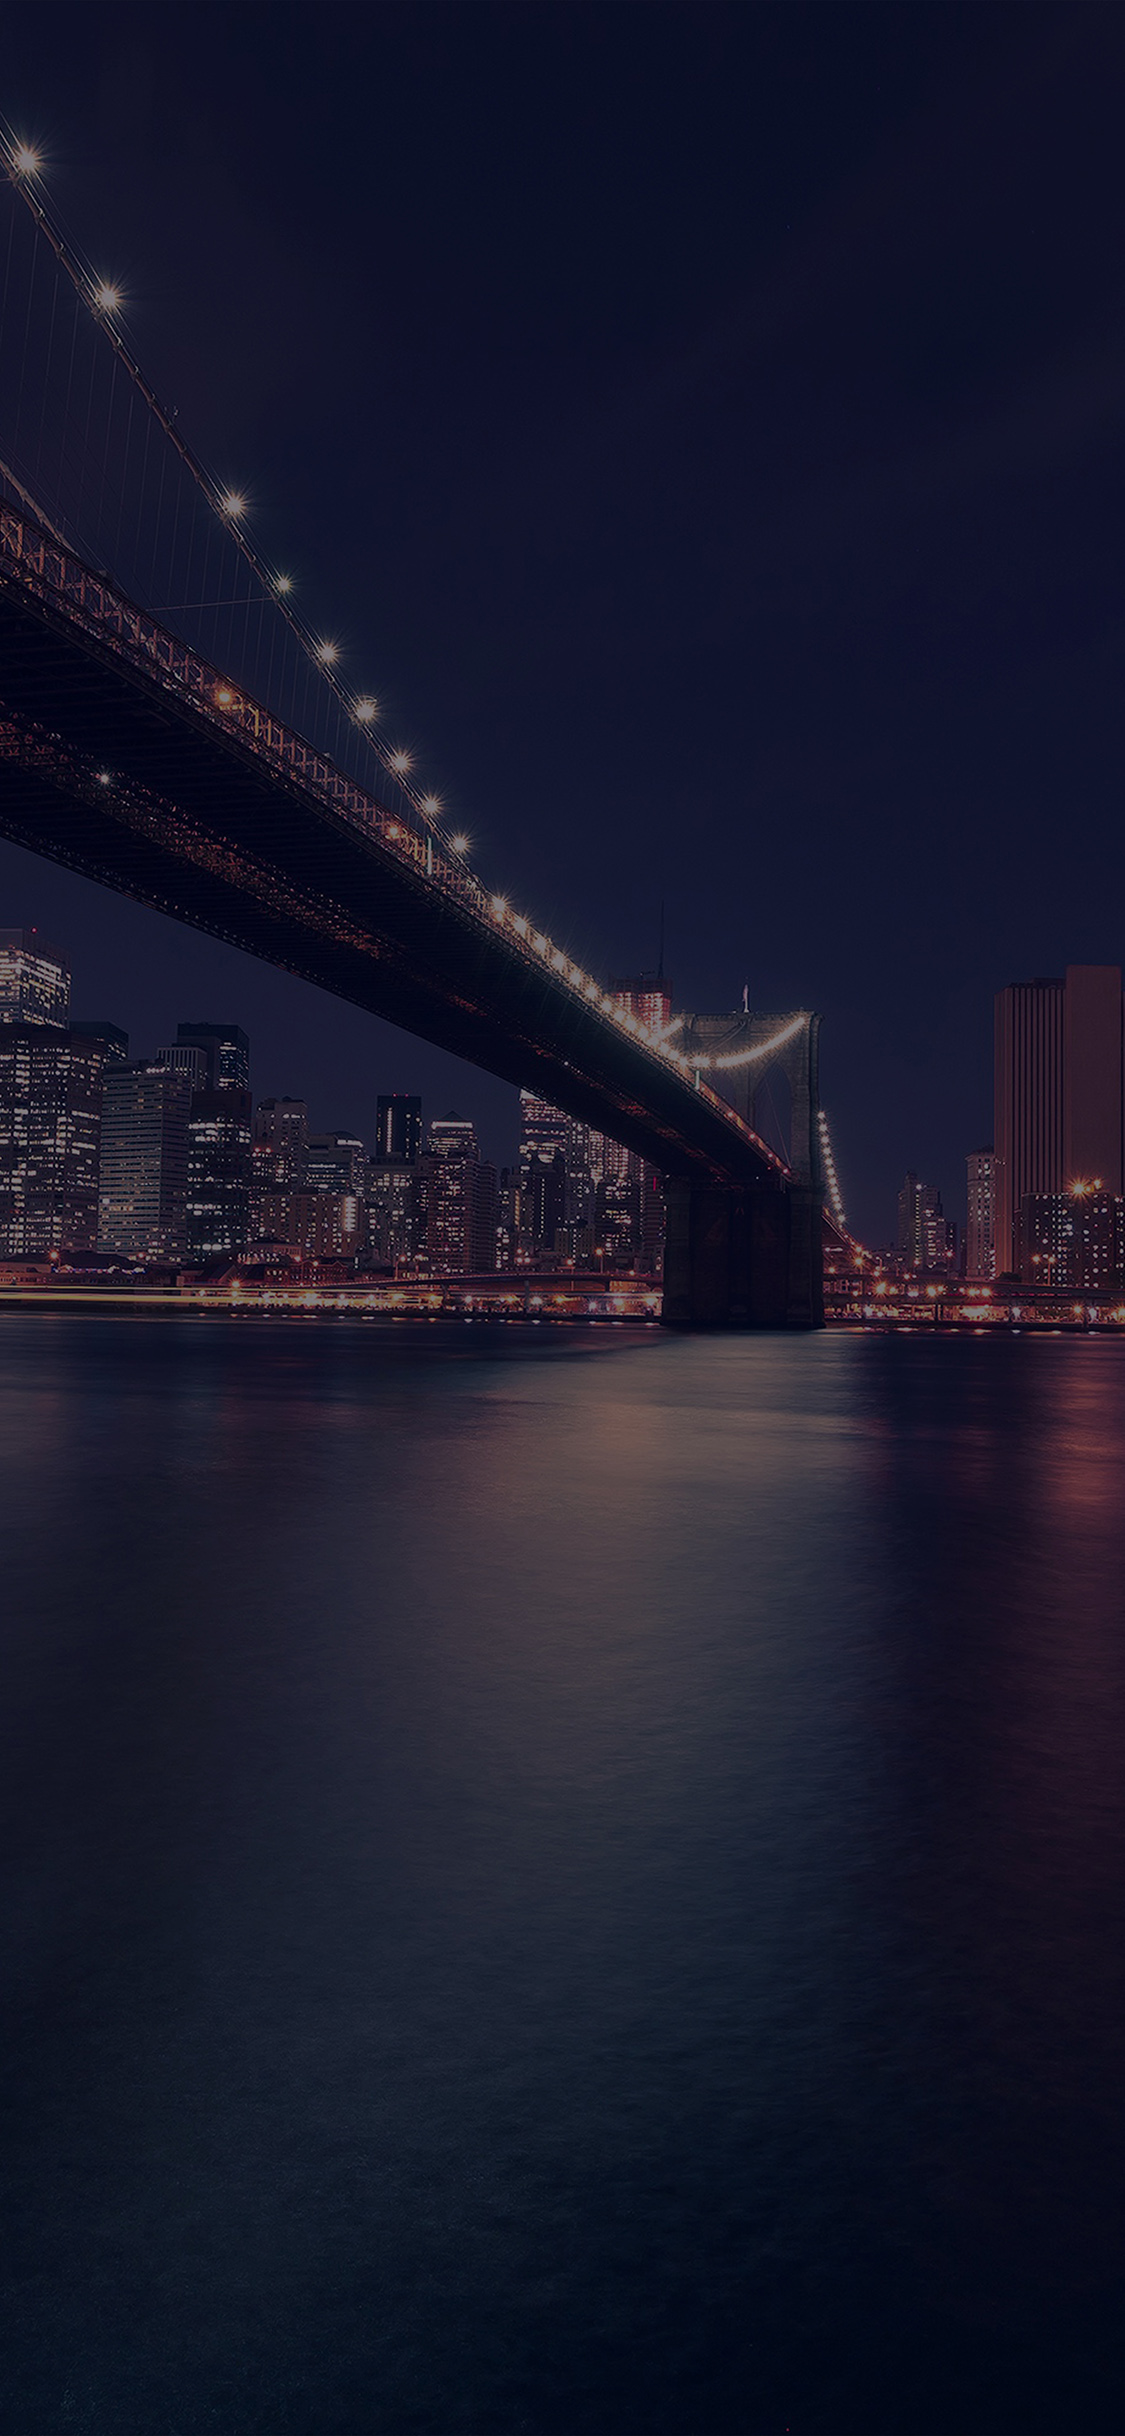 City night river iPhone X wallpaper